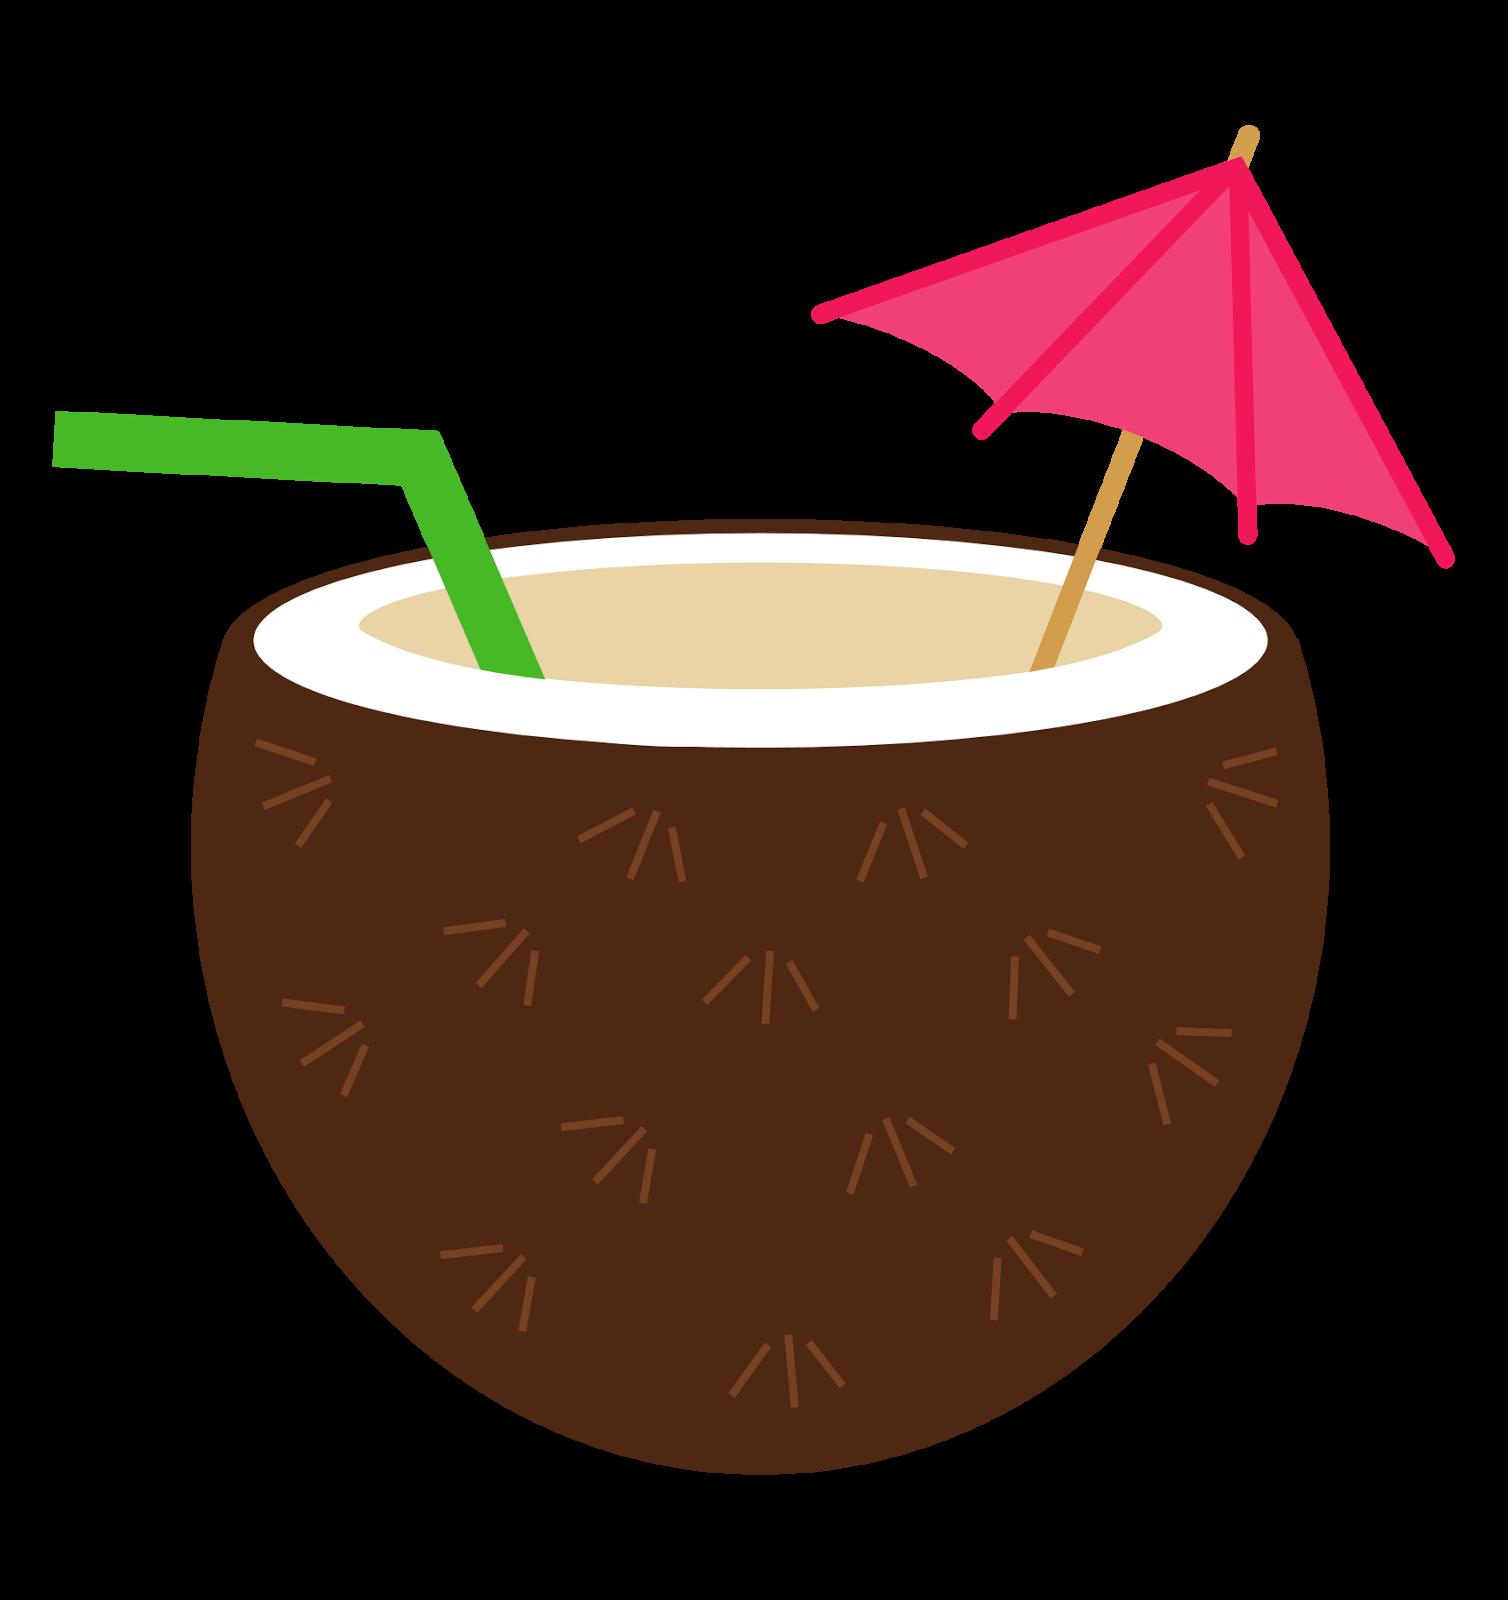 Free Coconut Cliparts, Download Free Clip Art, Free Clip Art.